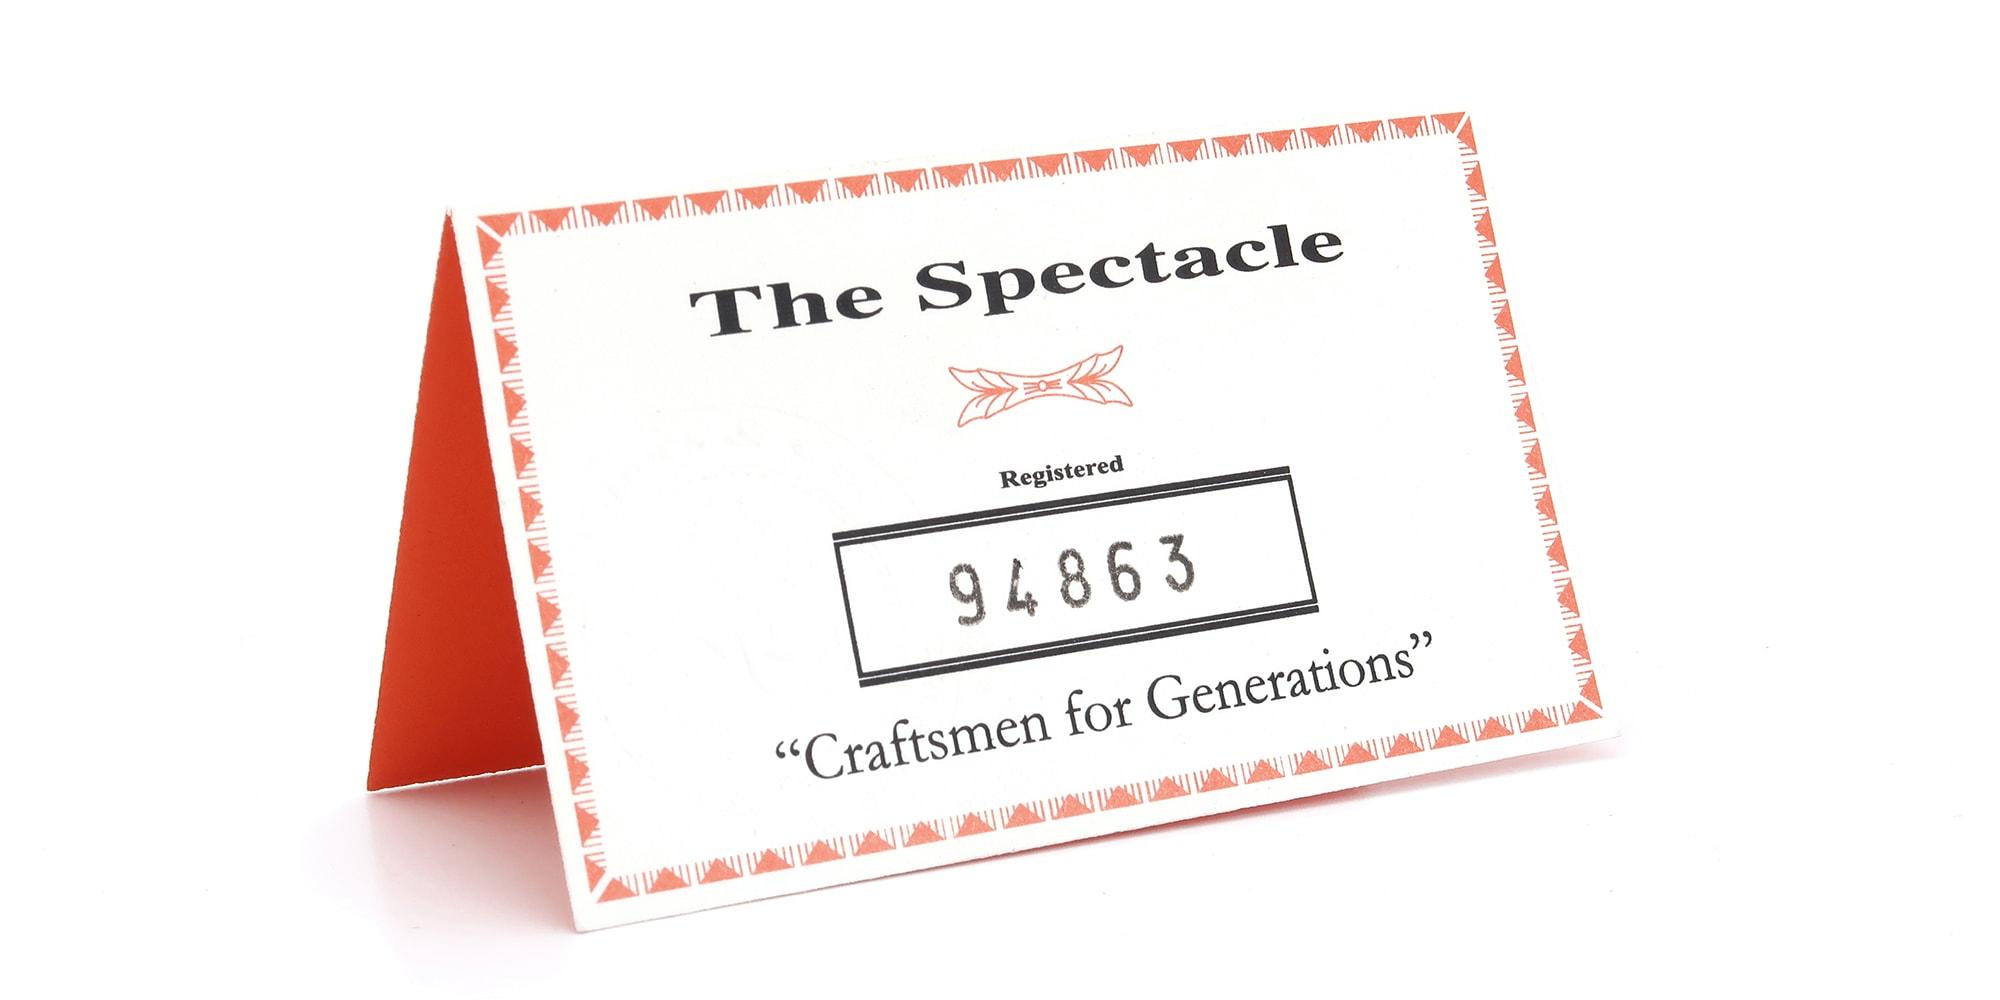 The Spectacle メガネ 1937 Artcraft Optical The-Artbit NOKOROD P-6 G 12kPads 46-22 イメージ8